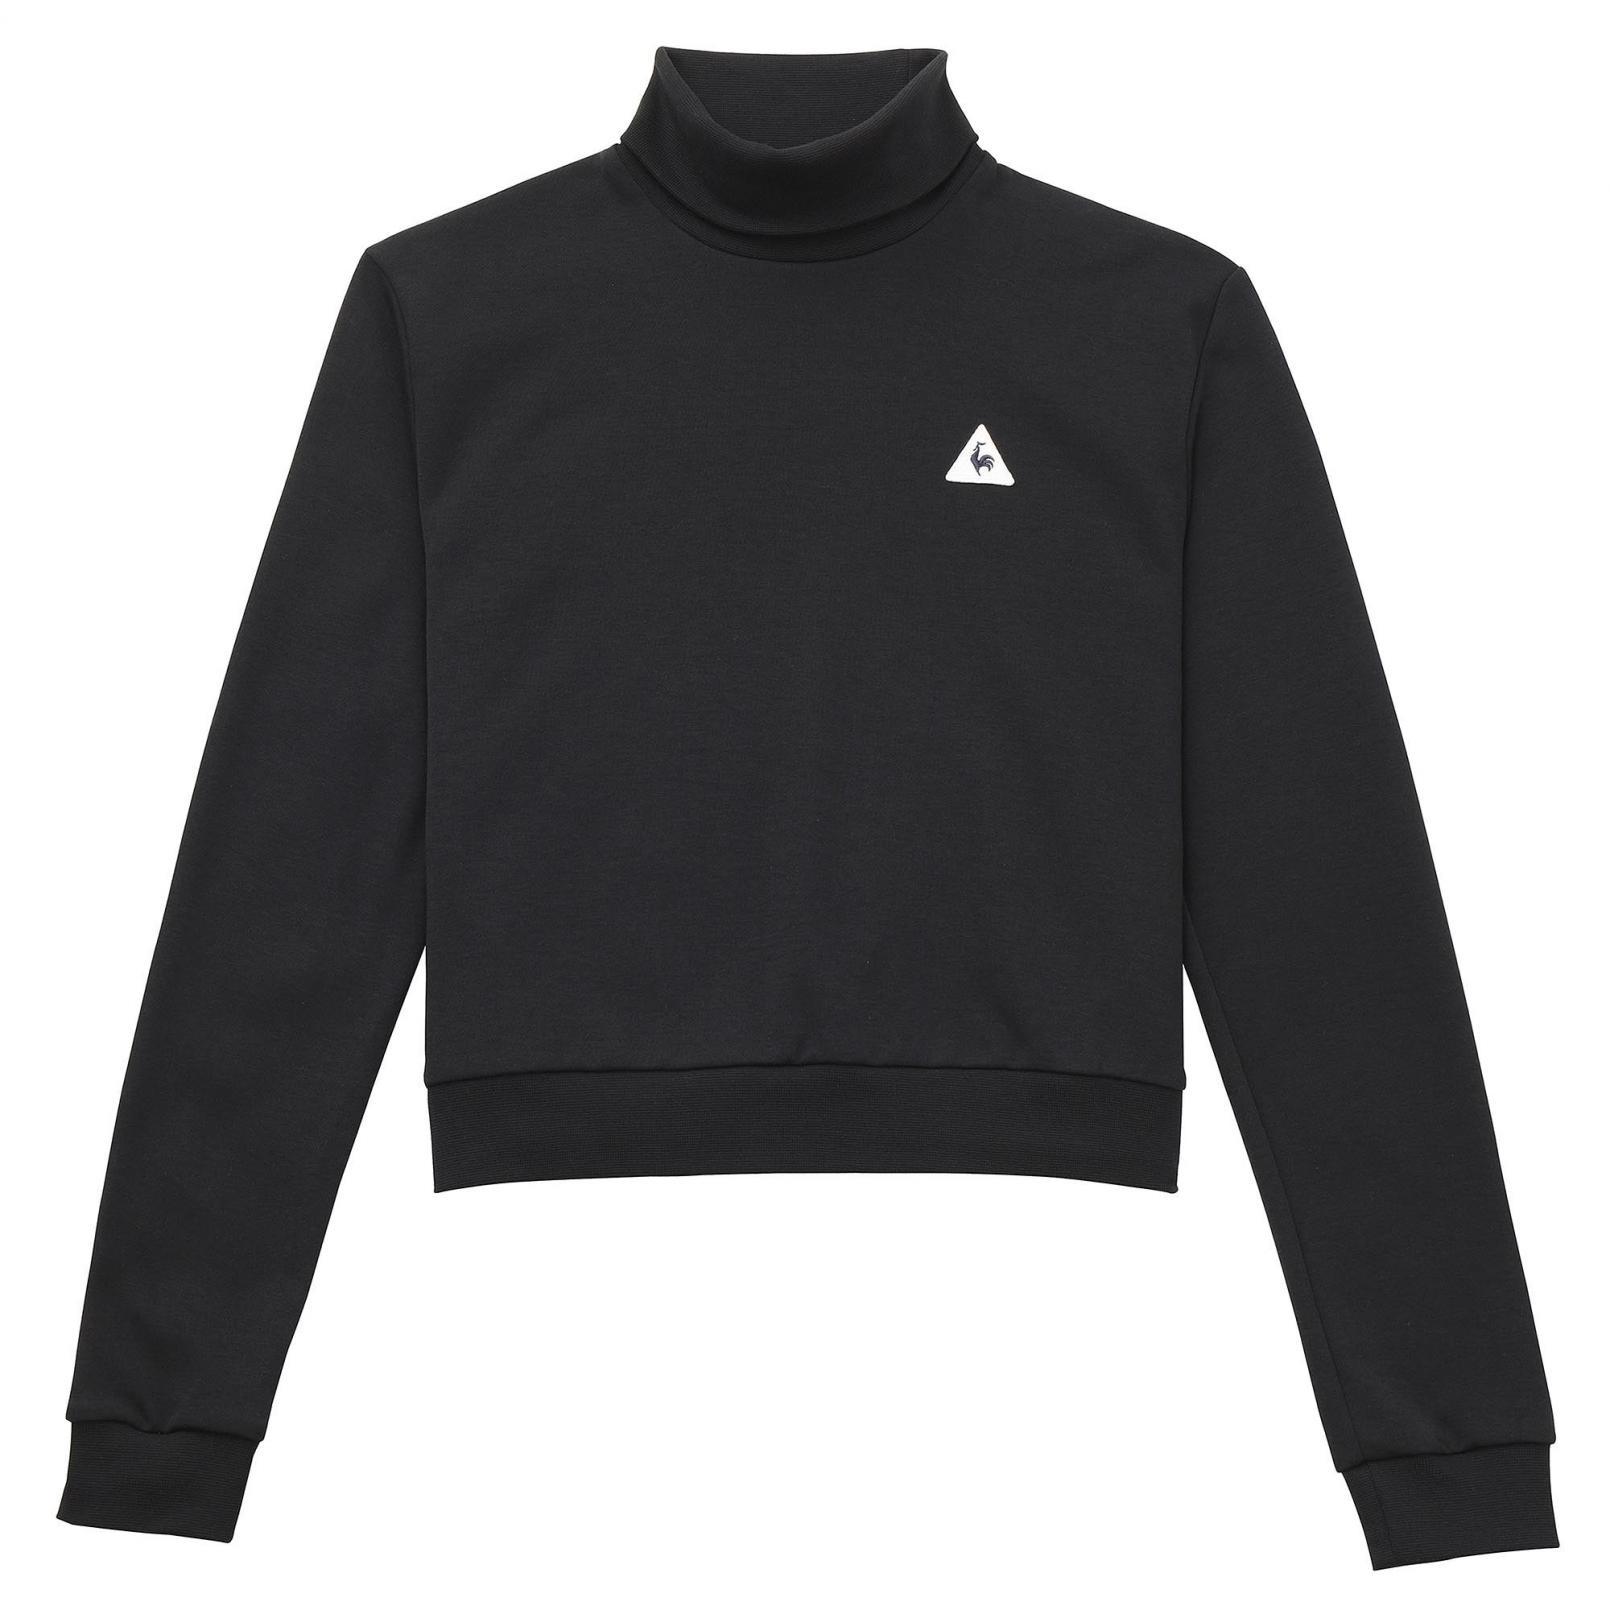 Sweatshirts & Hoodies – Le Coq Sportif Essentiels Crop Crew Sweat Black